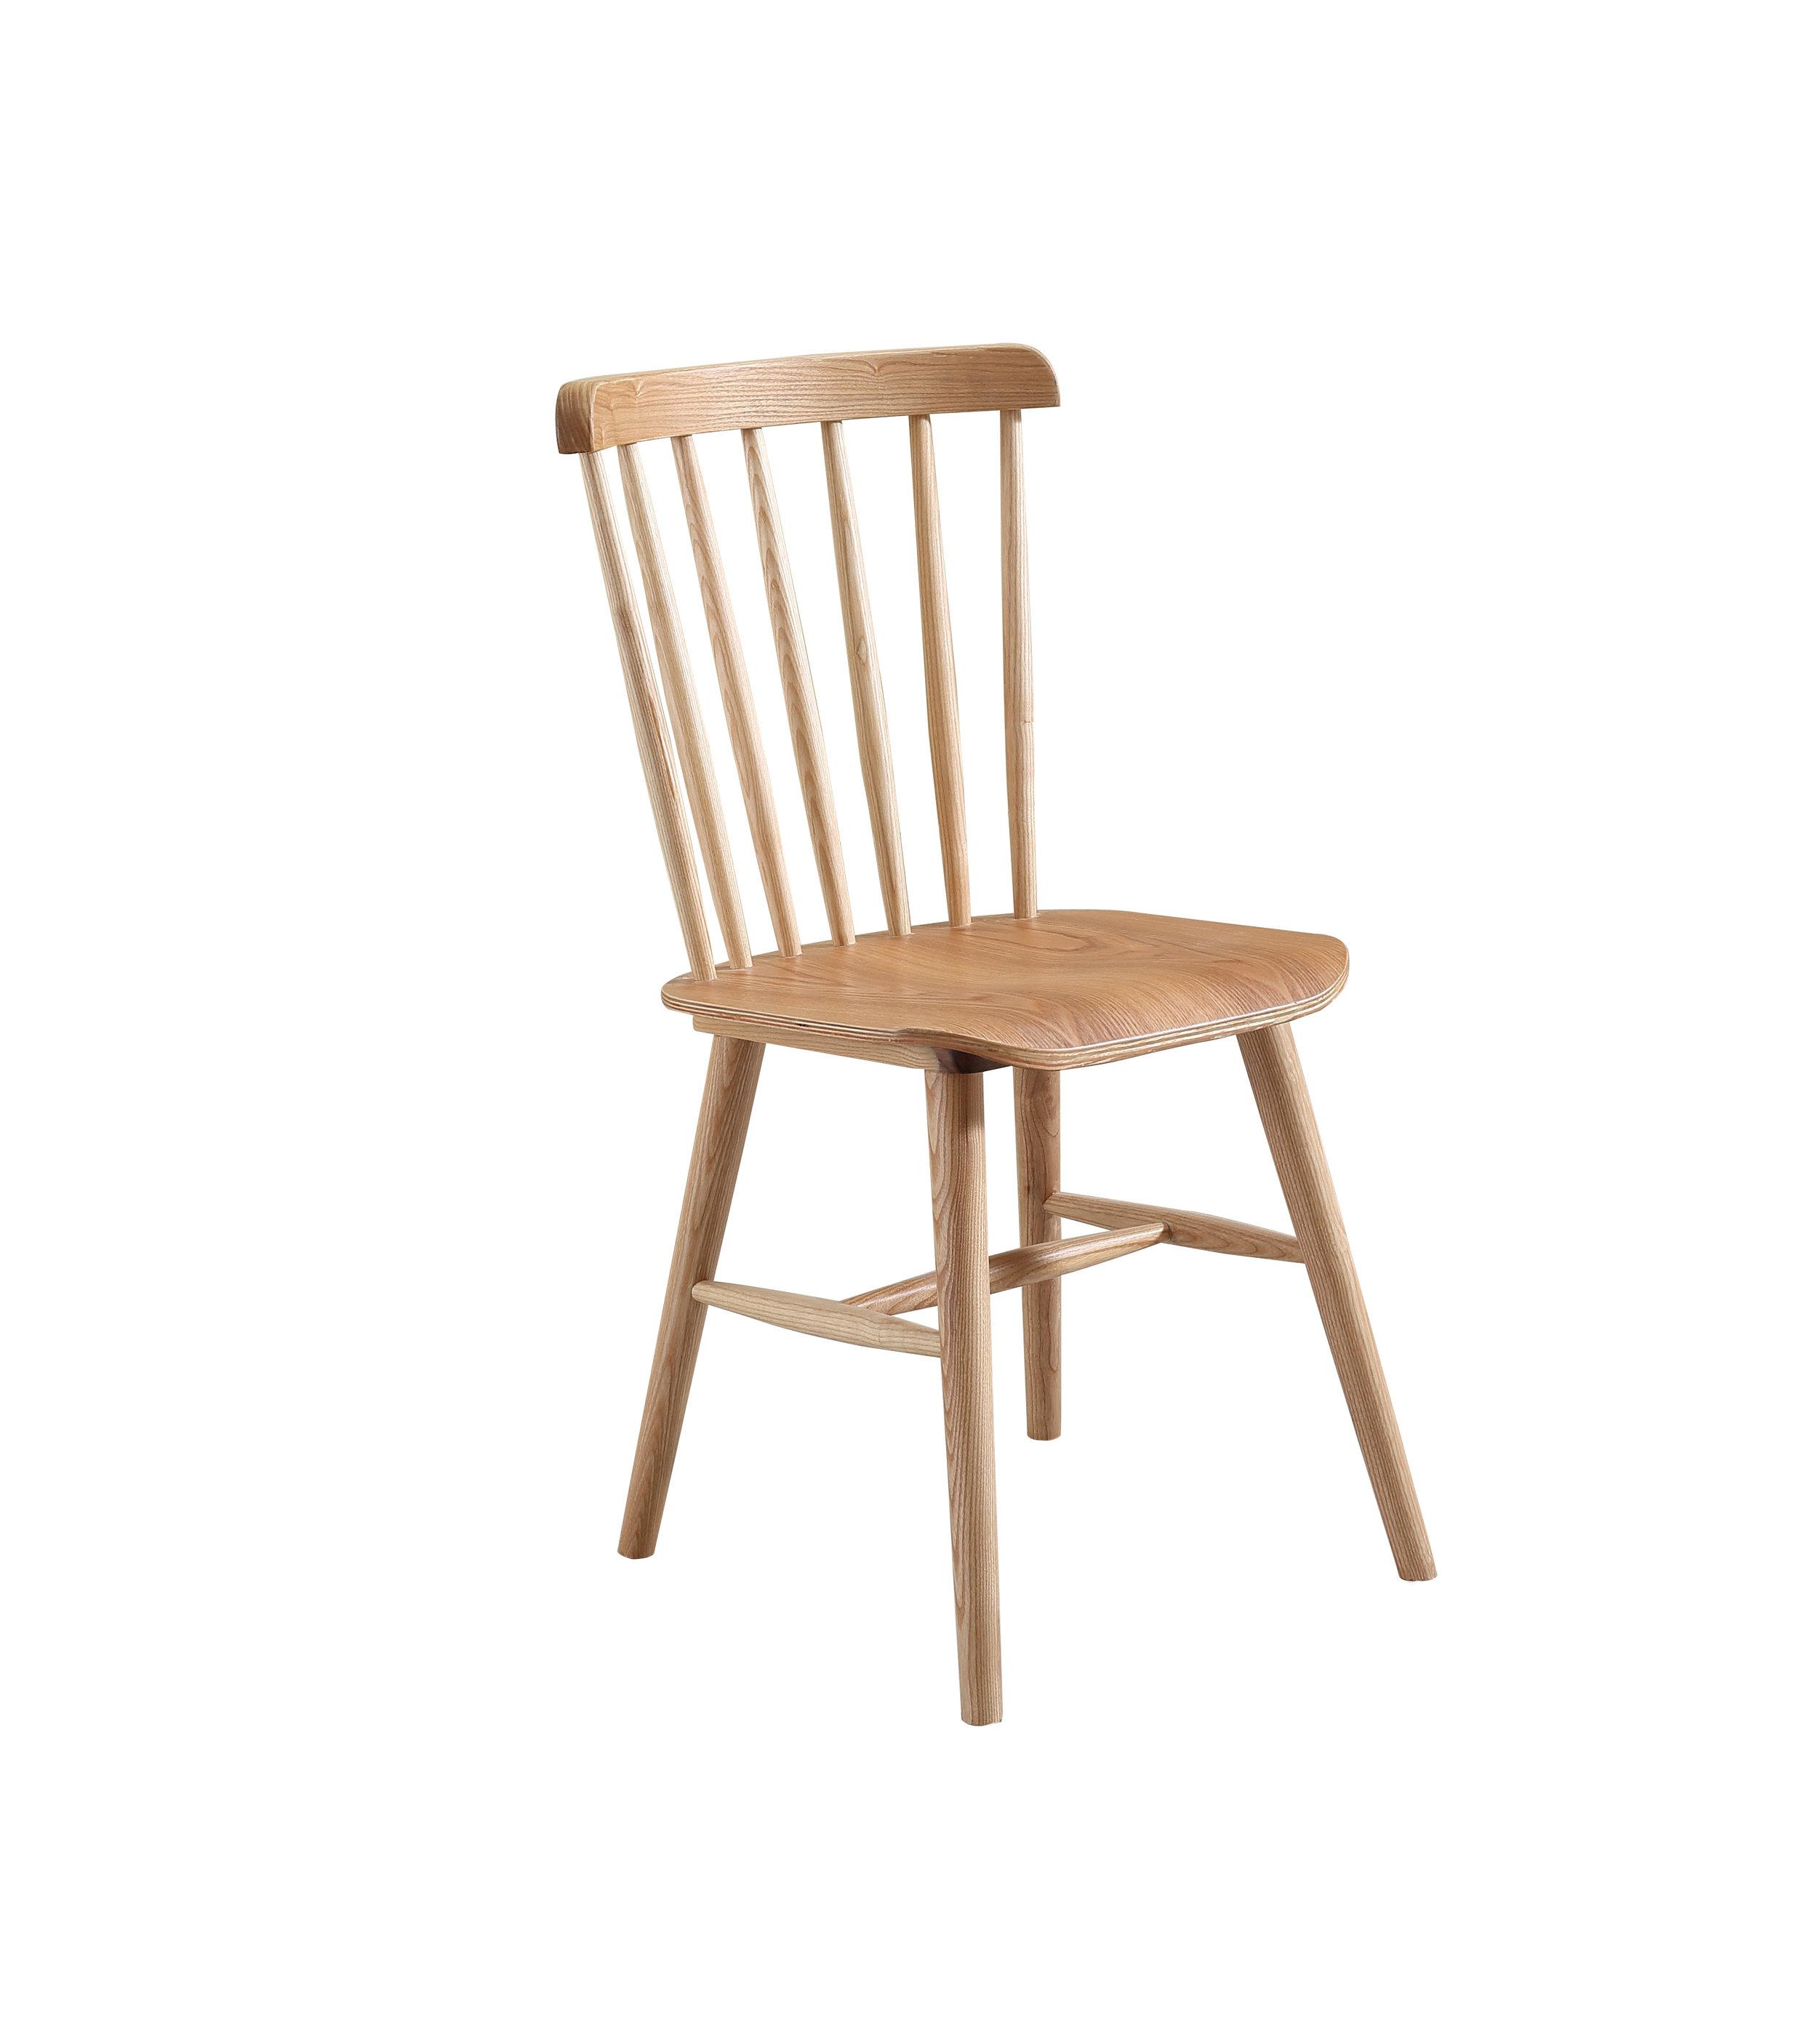 Scandin Chair $129 each